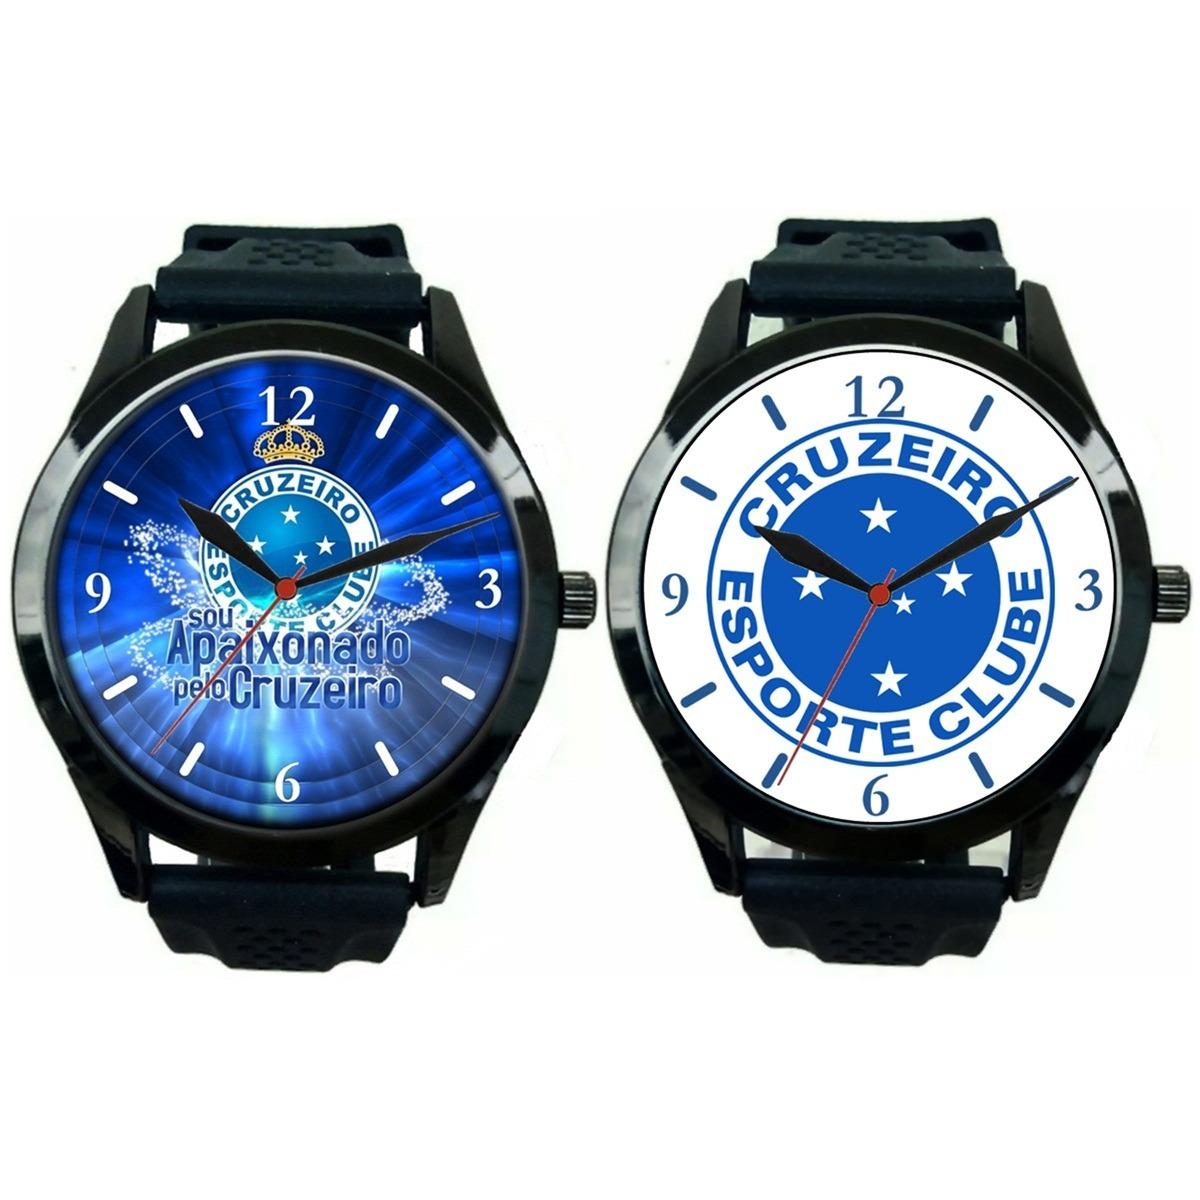 fe95aee2c4b kit 2 relógios pulso esportivo cruzeiro masculino barato. Carregando zoom.